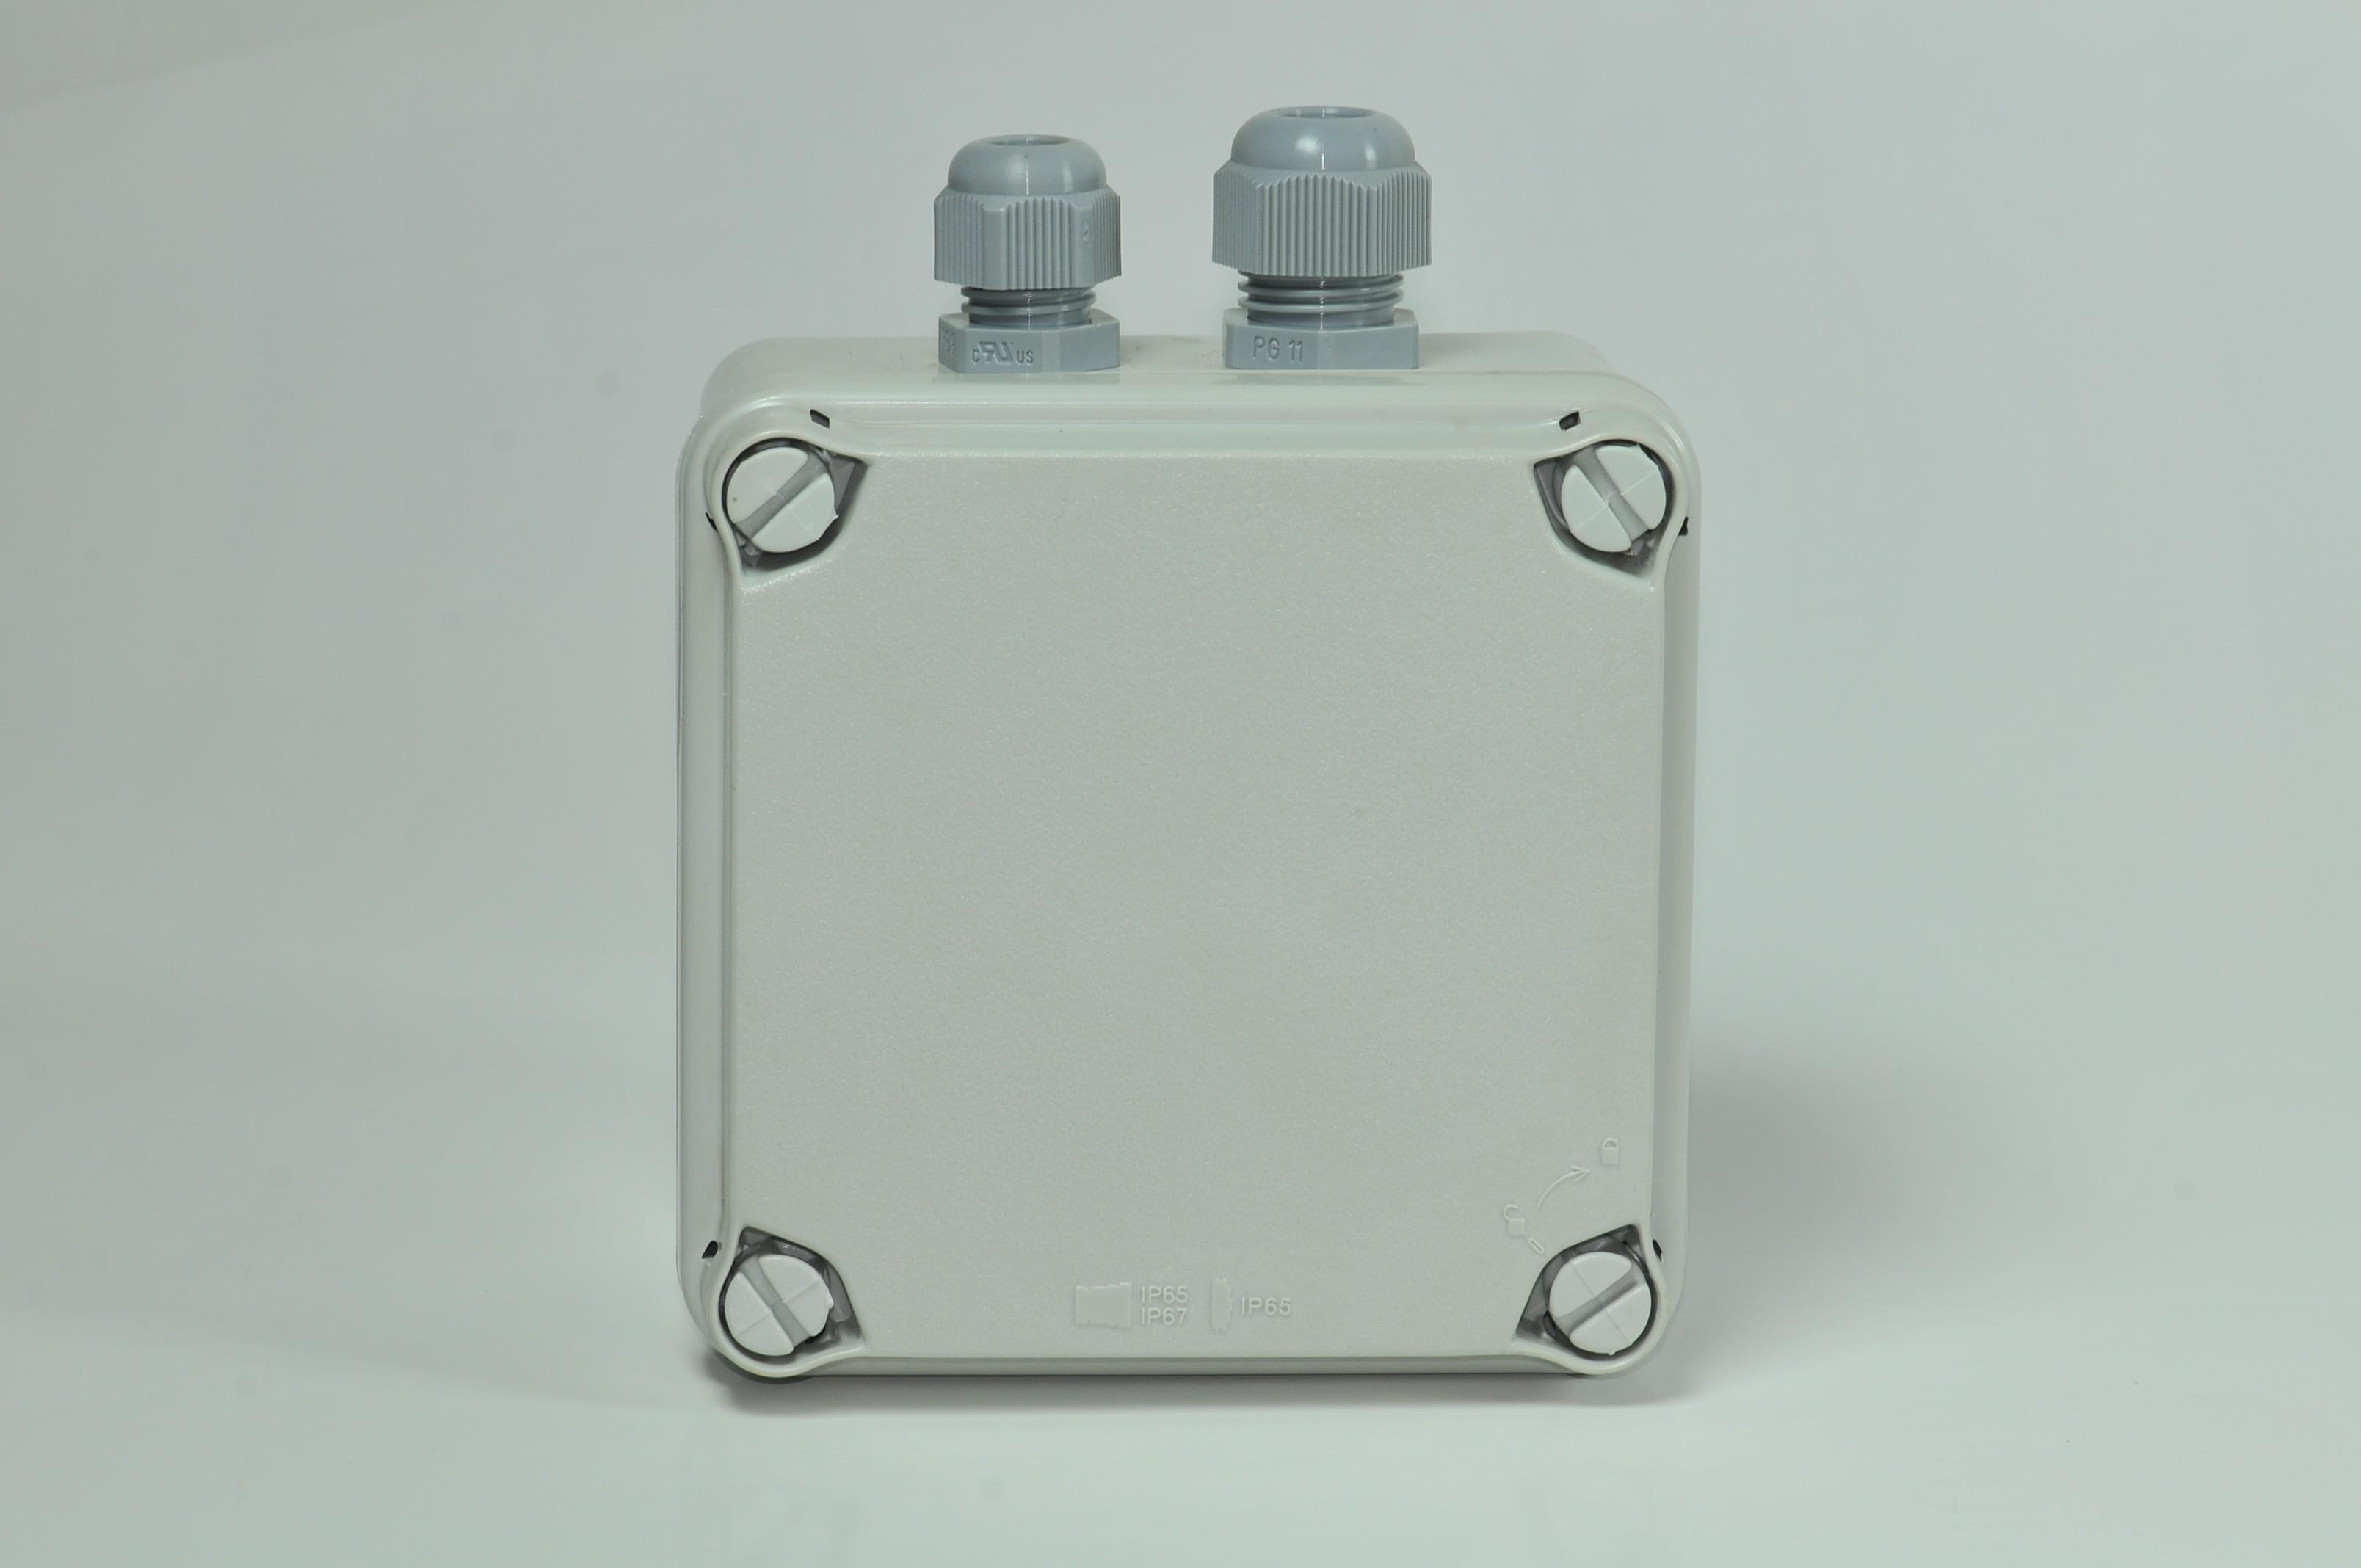 Kondensaattorikotelo 8 µF